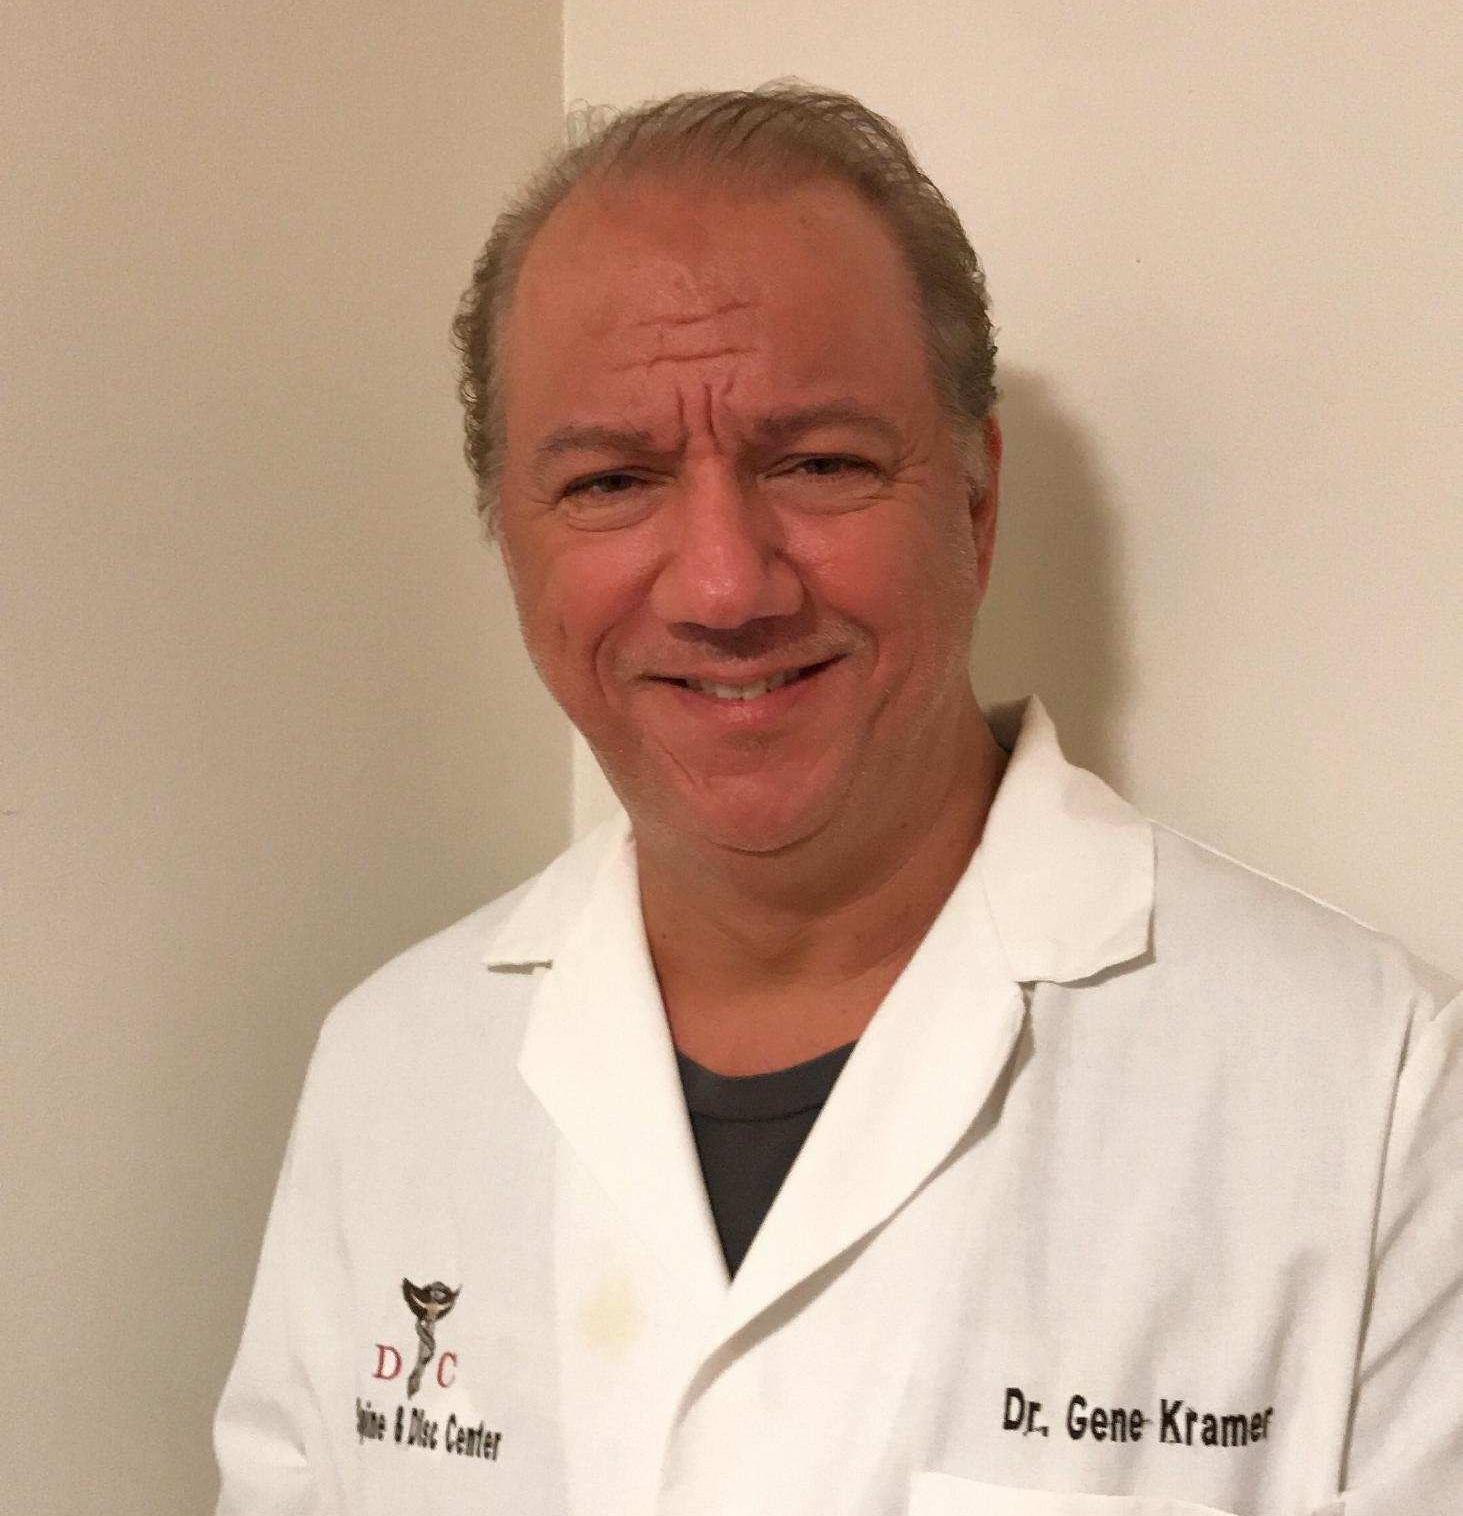 Dr Eugene Kramer Announces Scholarship Funding To Medical Student in the US